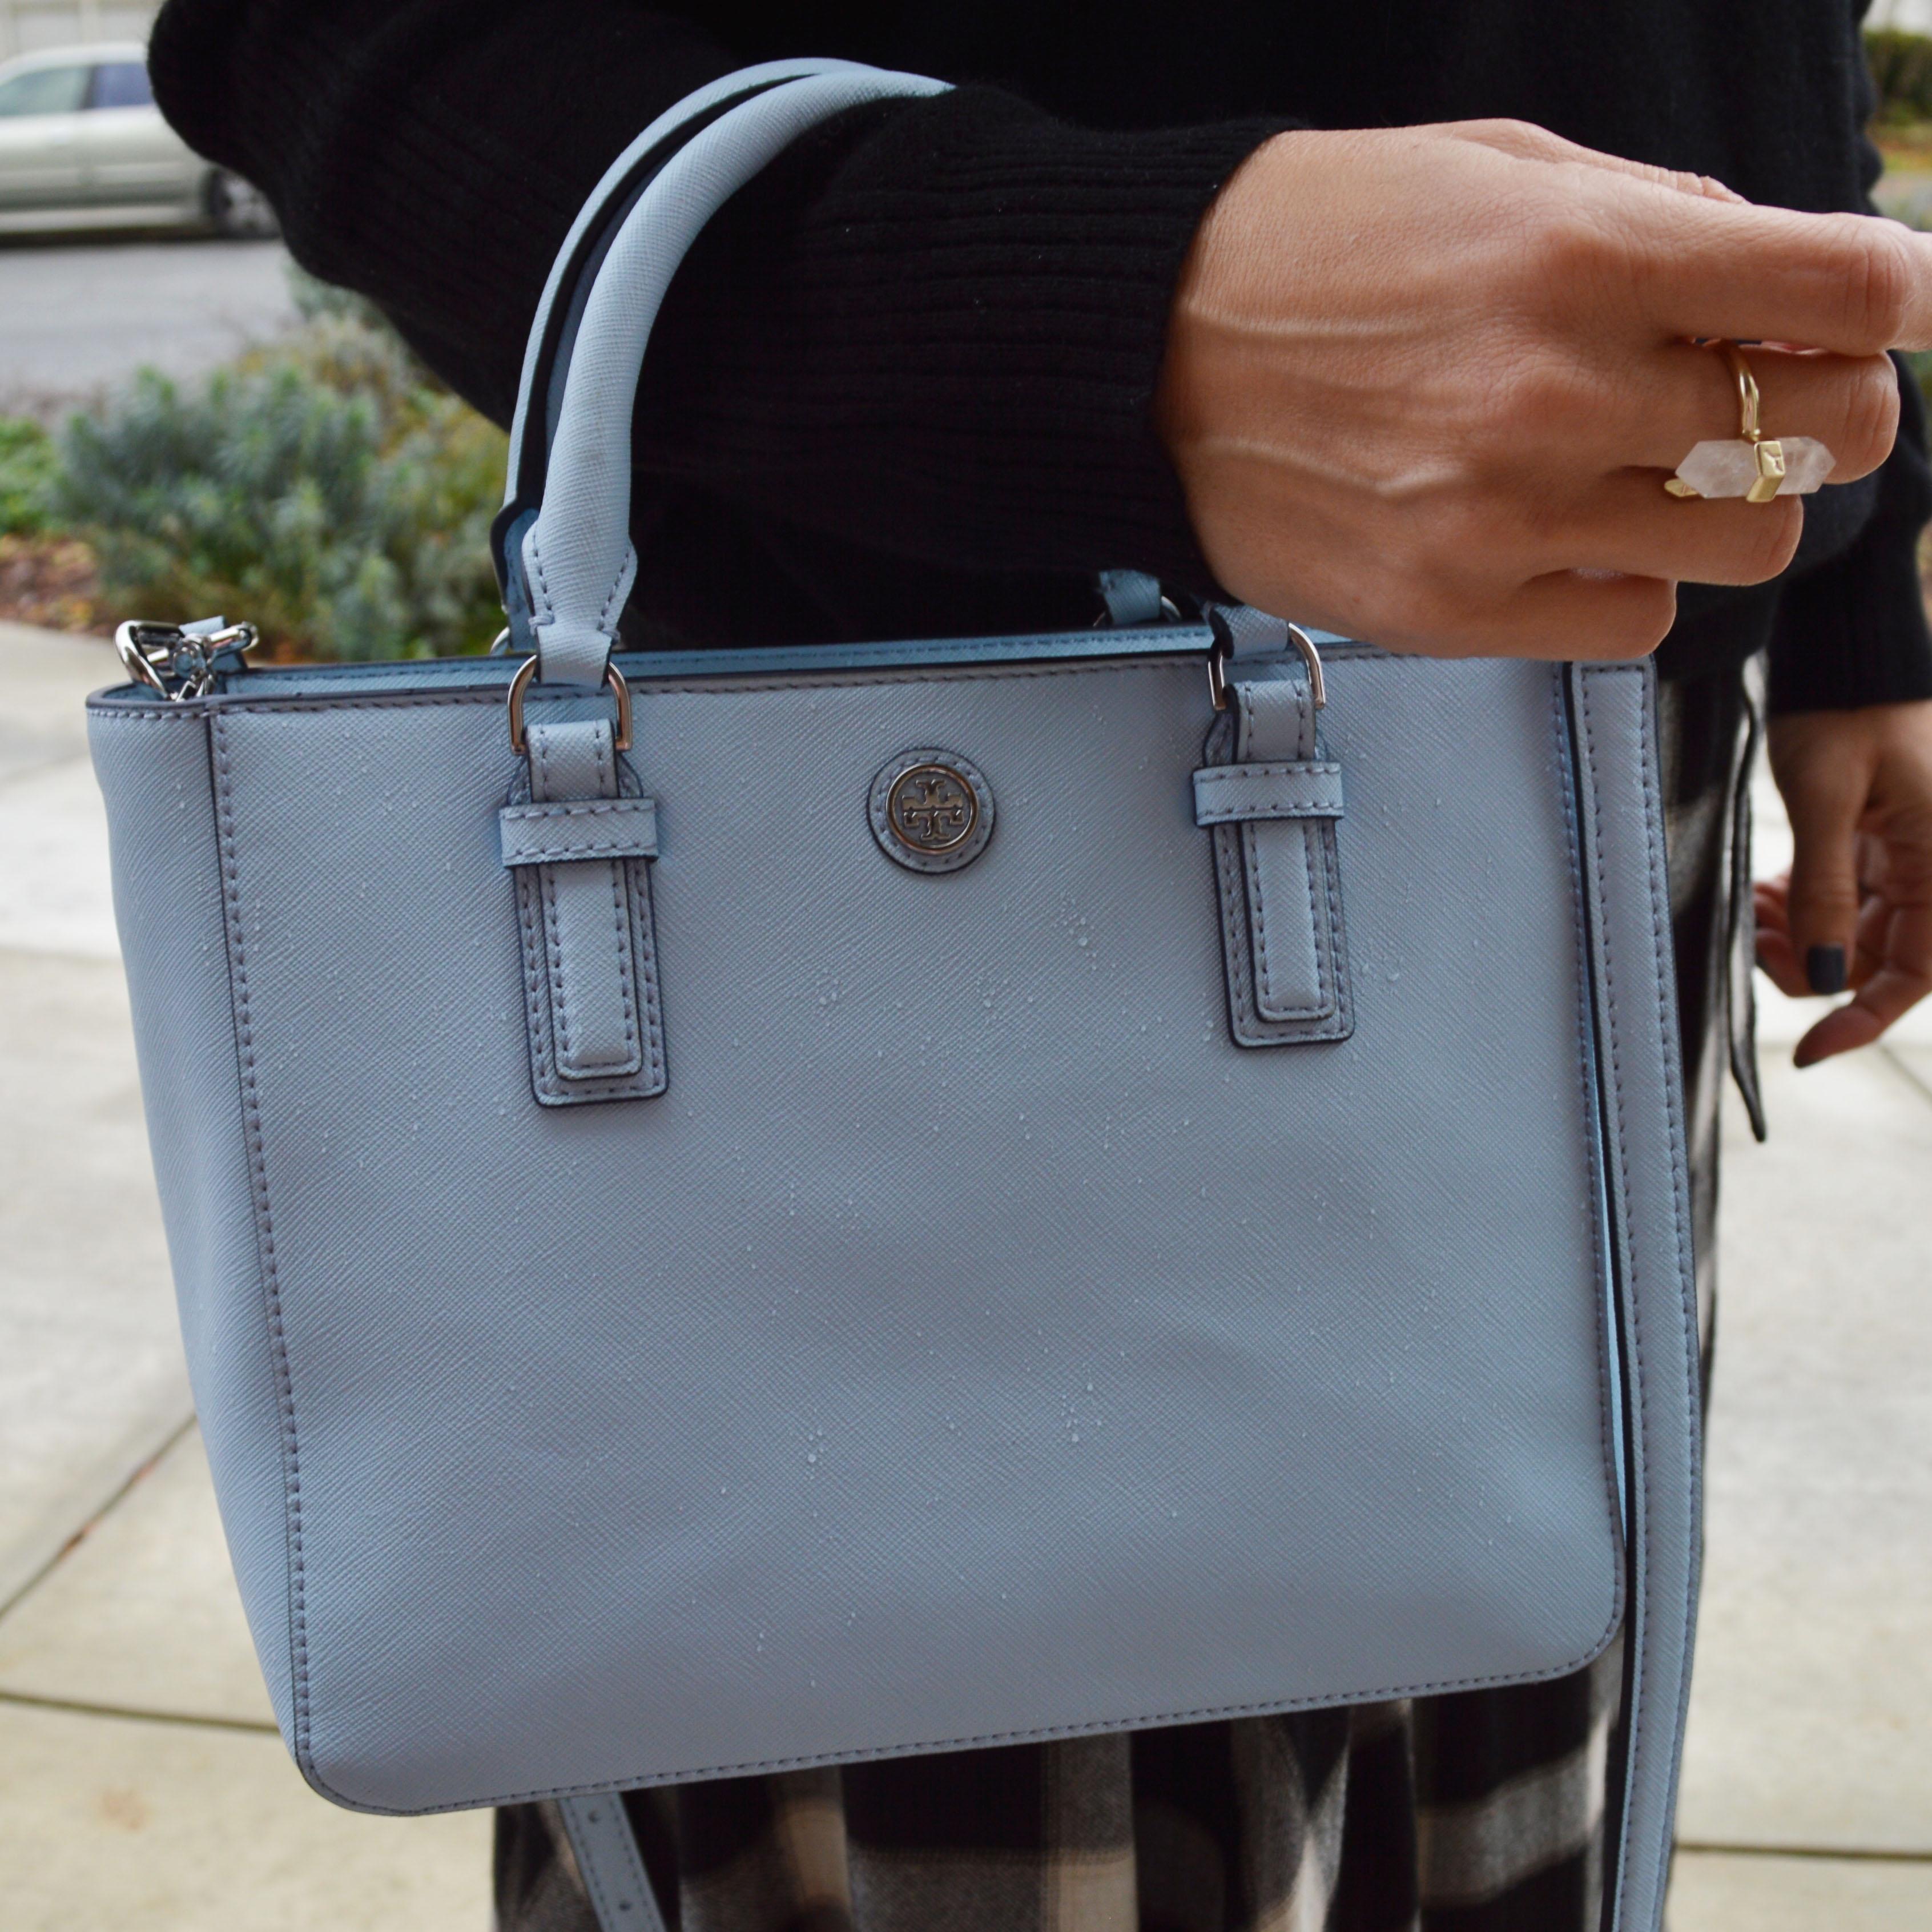 c10bbd43cdb0 Tory Burch Robinson Mini satchel review – Bay Area Fashionista